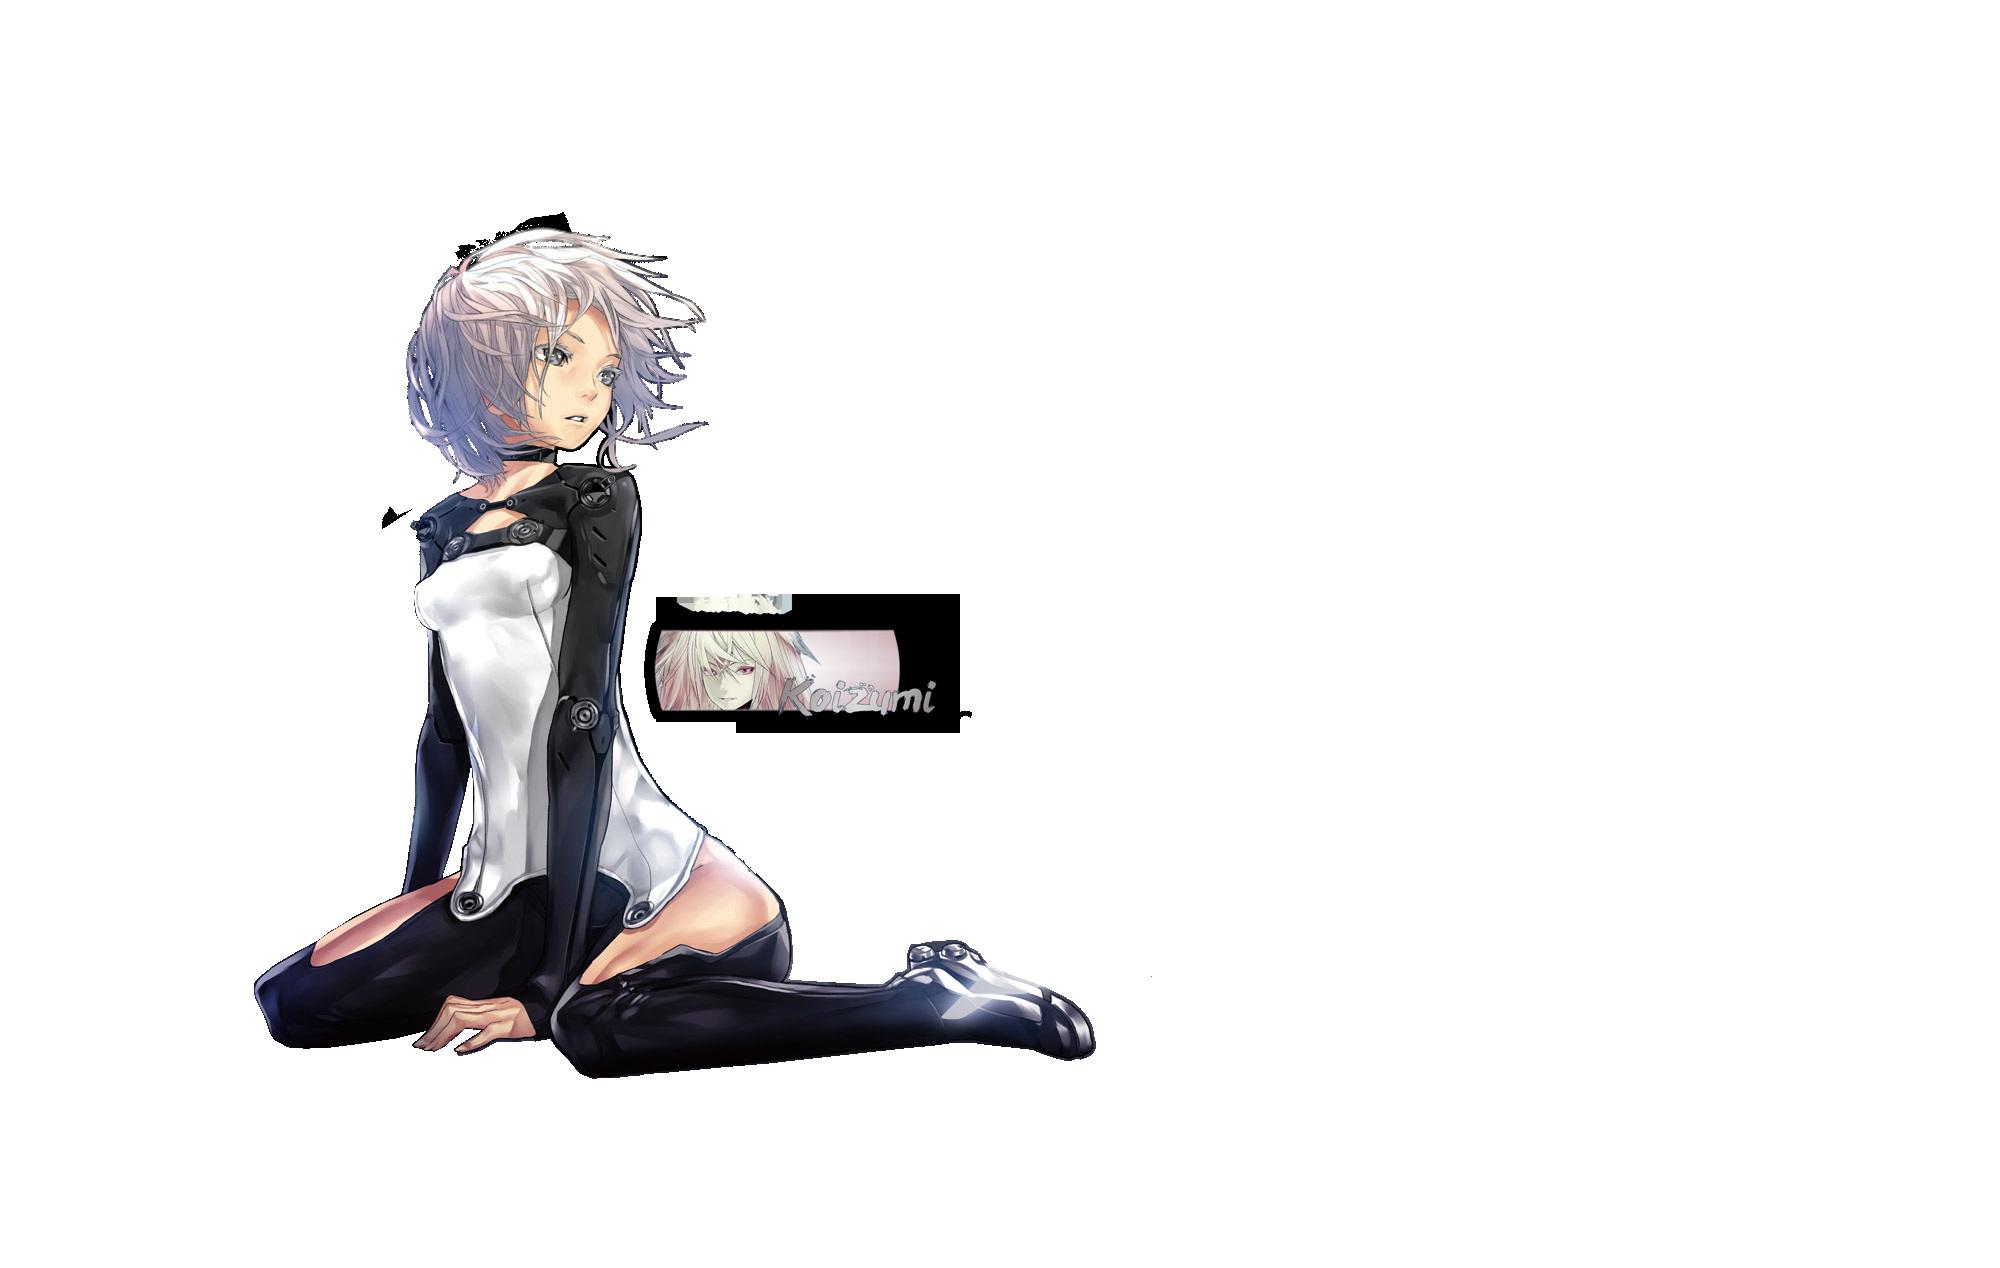 Le retour en force òwo Anime_girl_render_by_lkoizumil-d5lsv1s